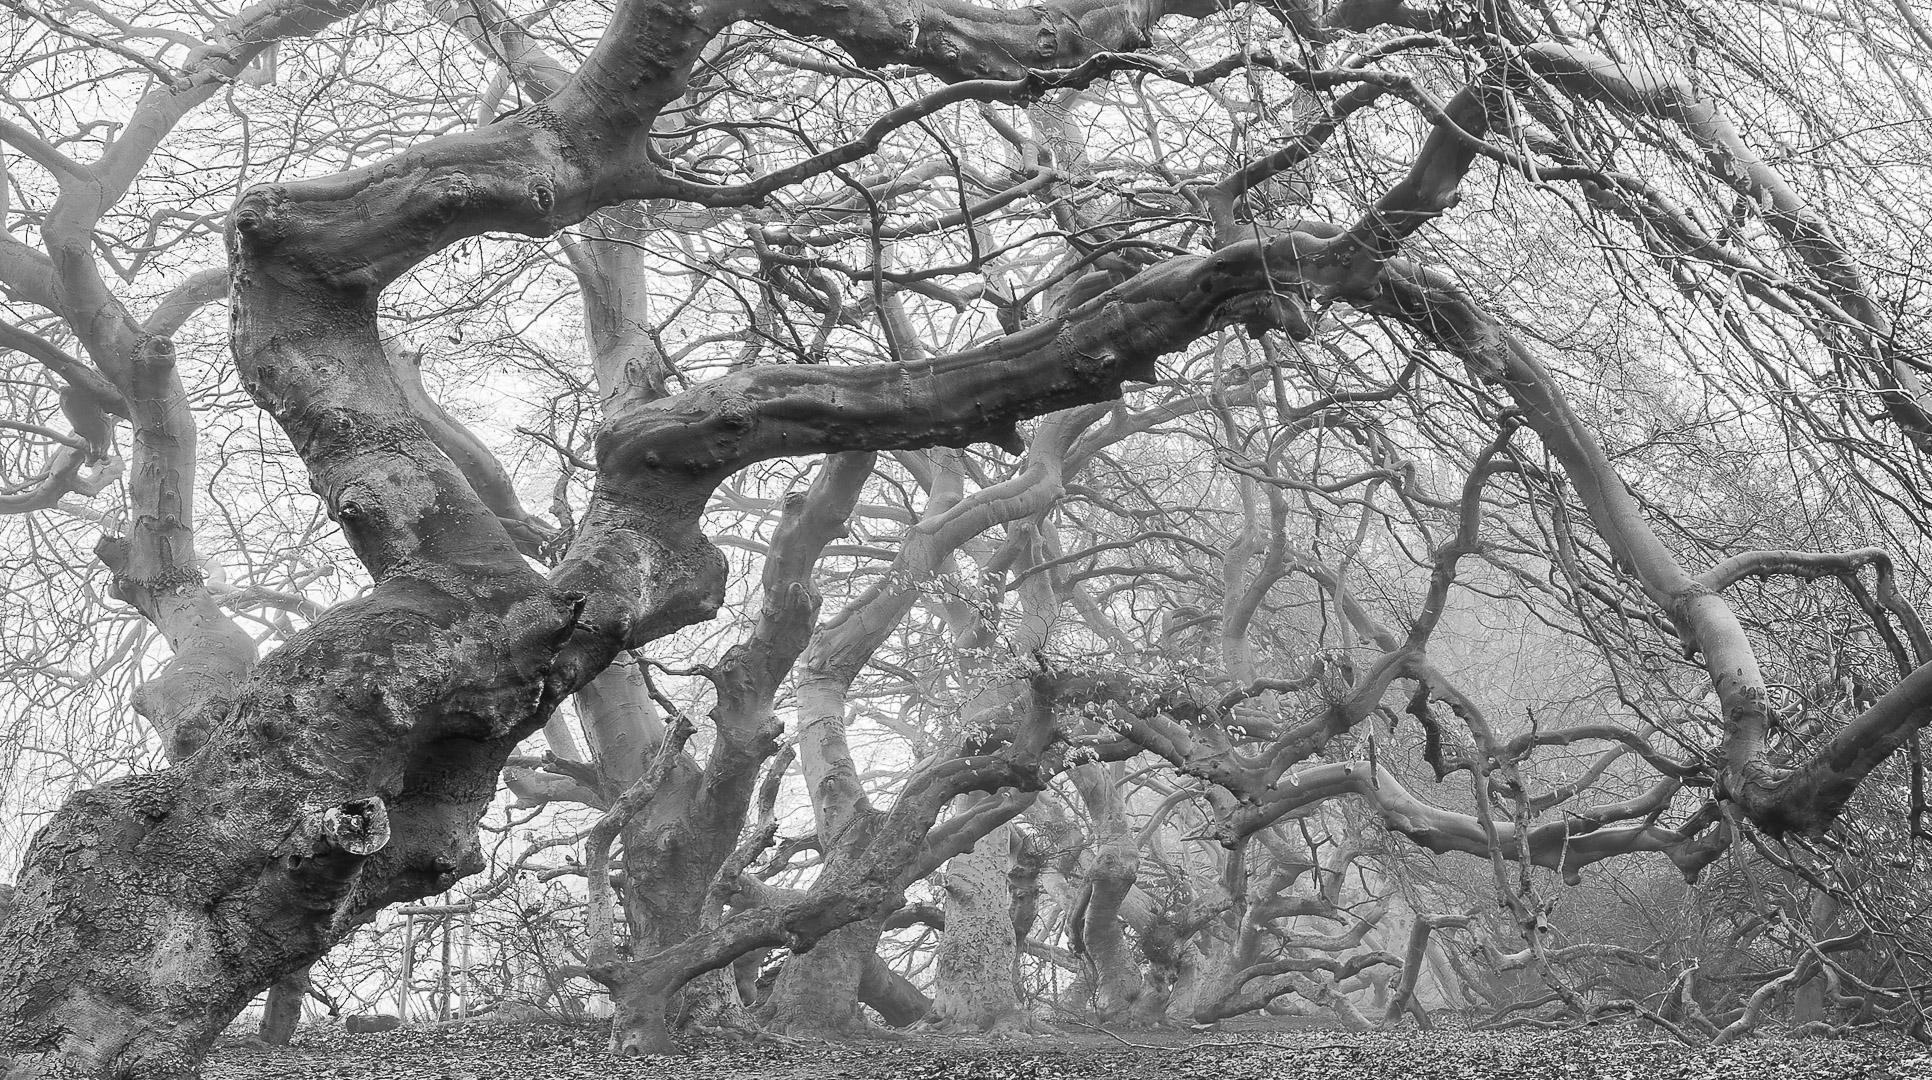 Nebelwald / foggy forest